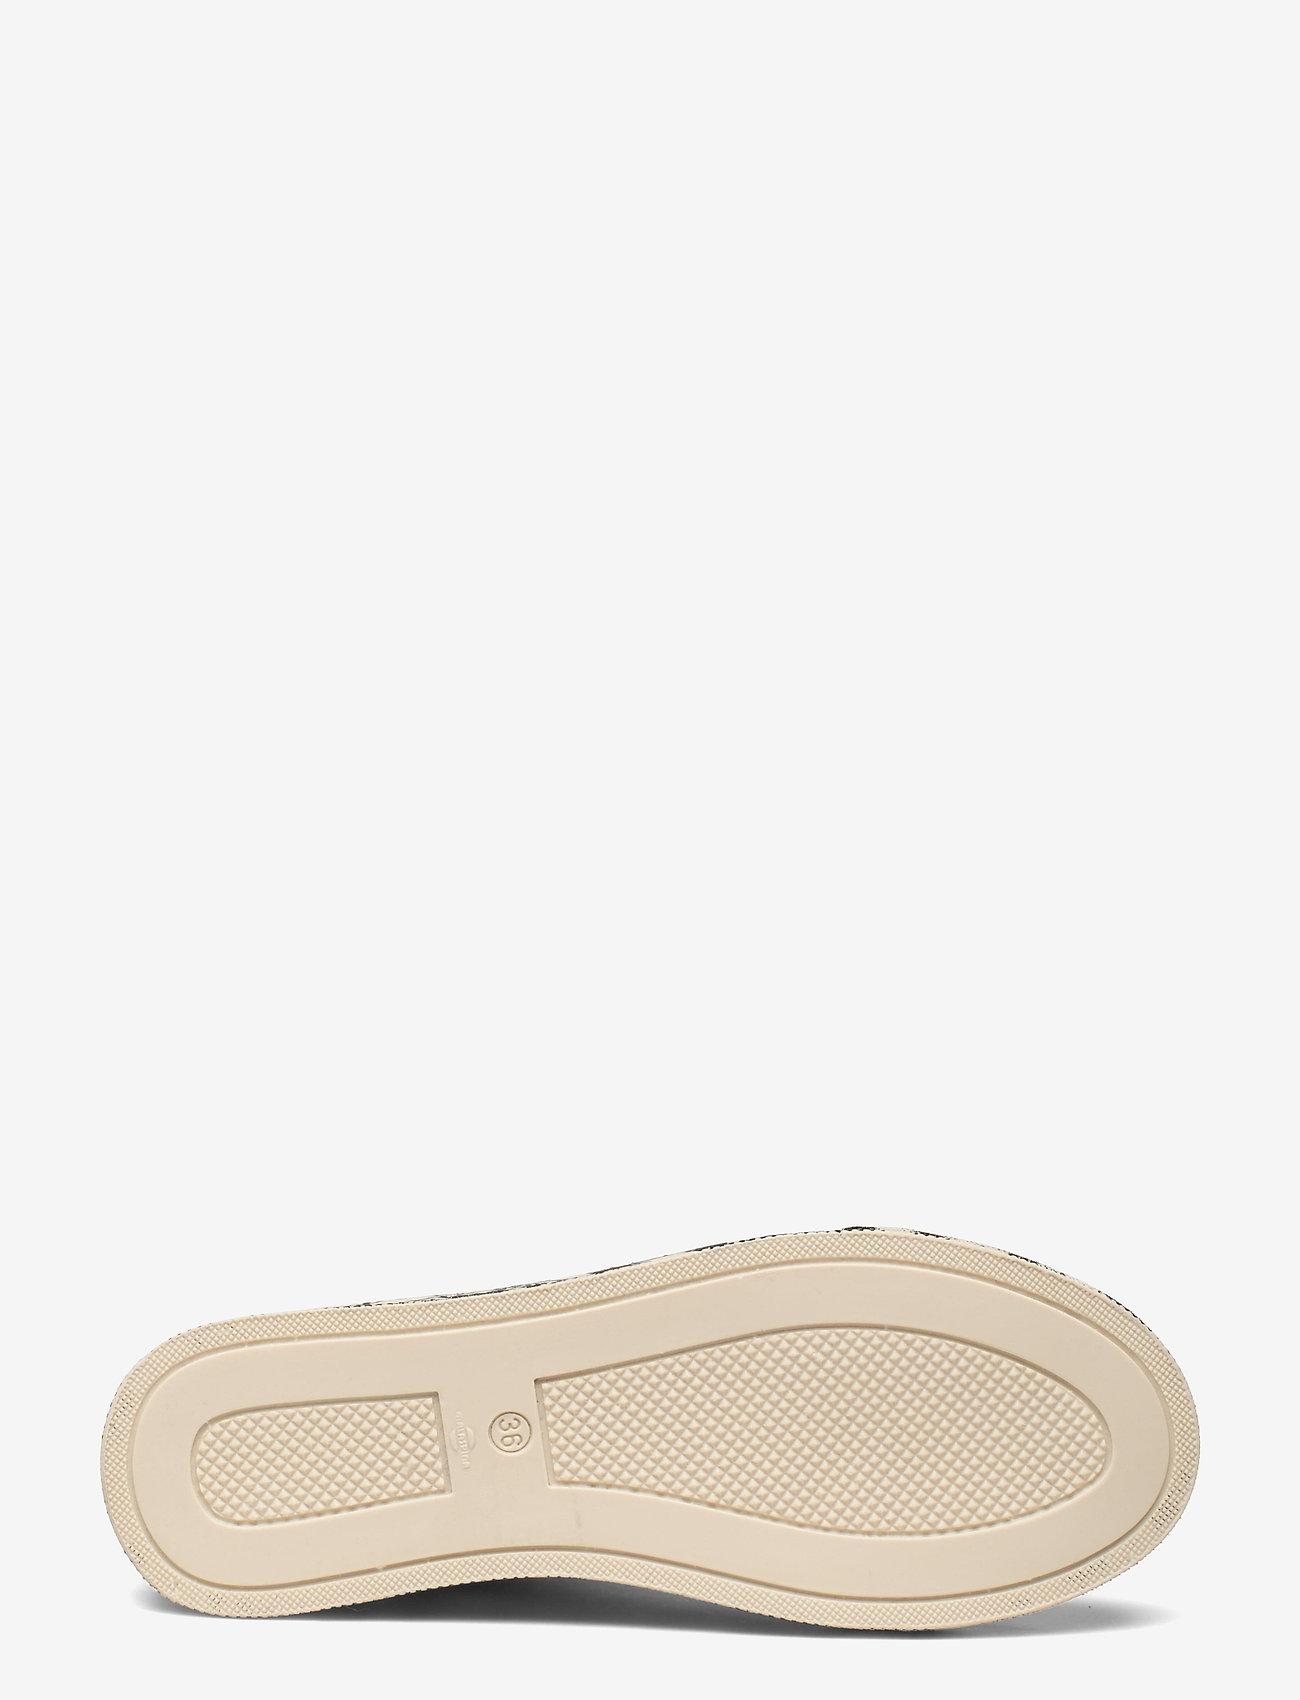 STINE GOYA - Zita, 1192 Cotton Canvas Sneakers - lave sneakers - opium negative - 4